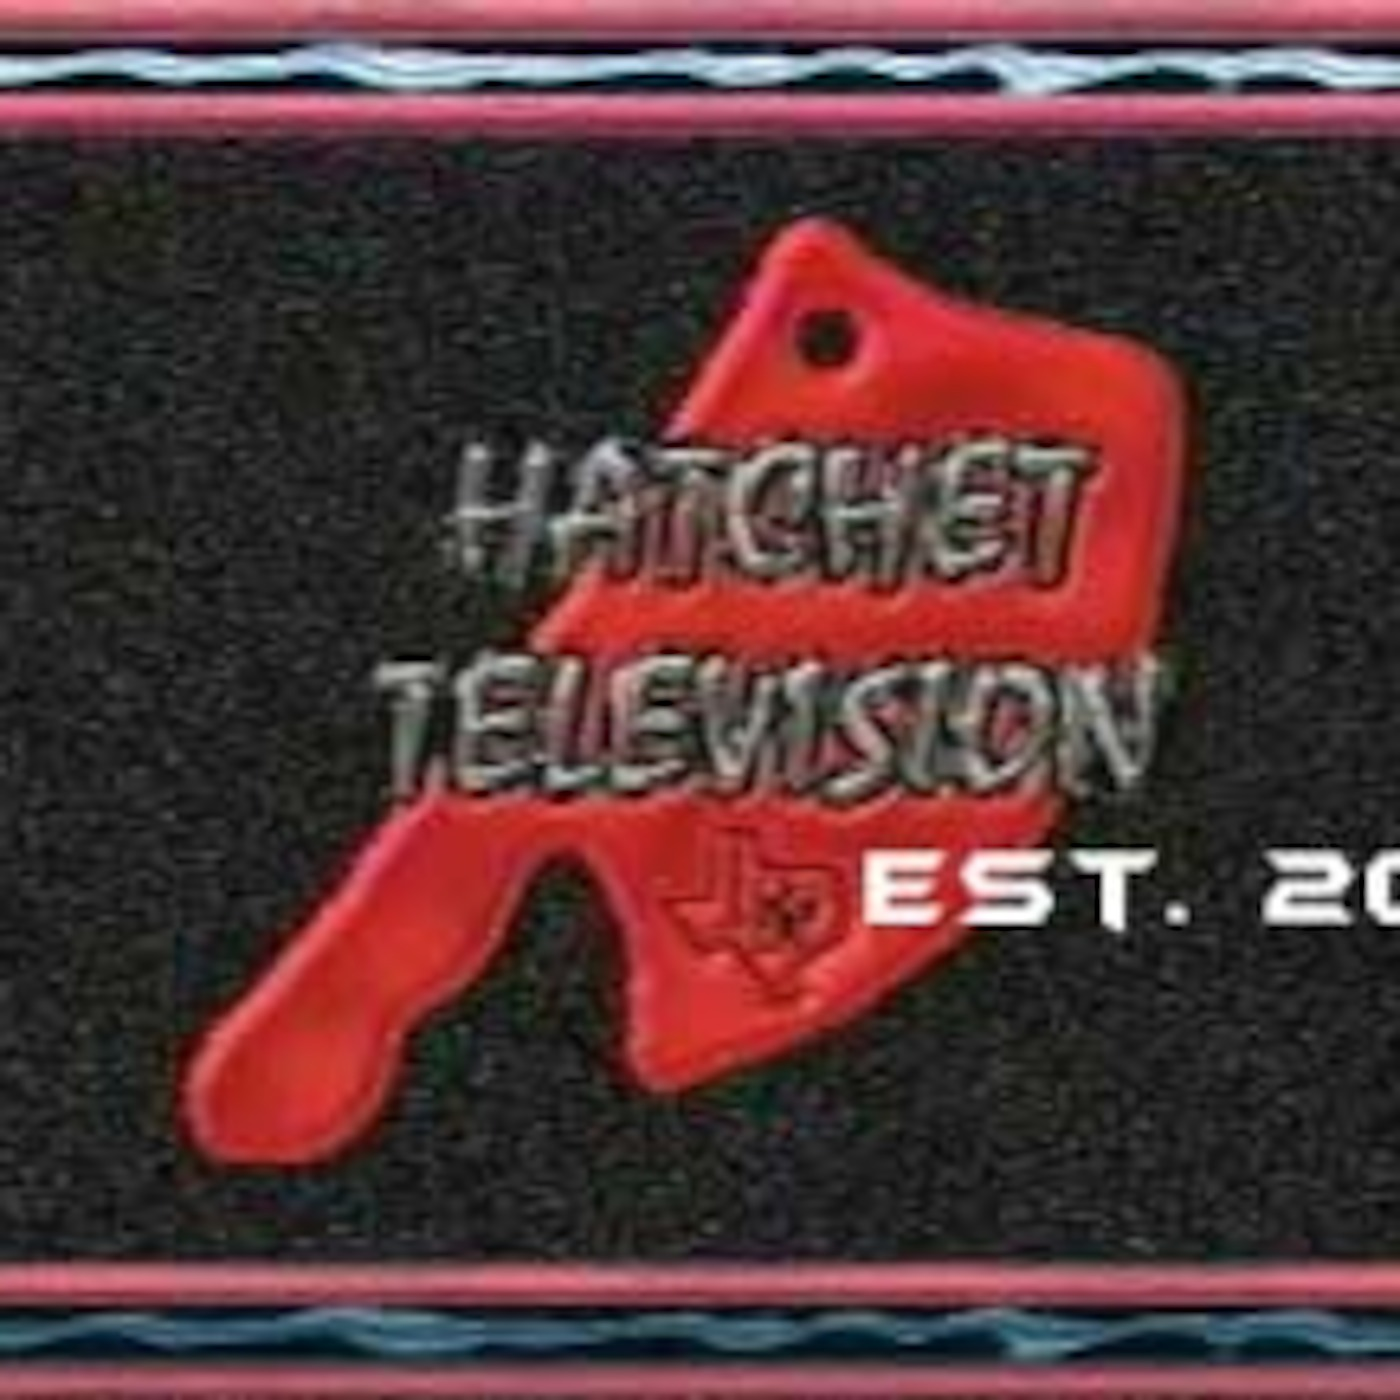 Hatchet TV's podcast